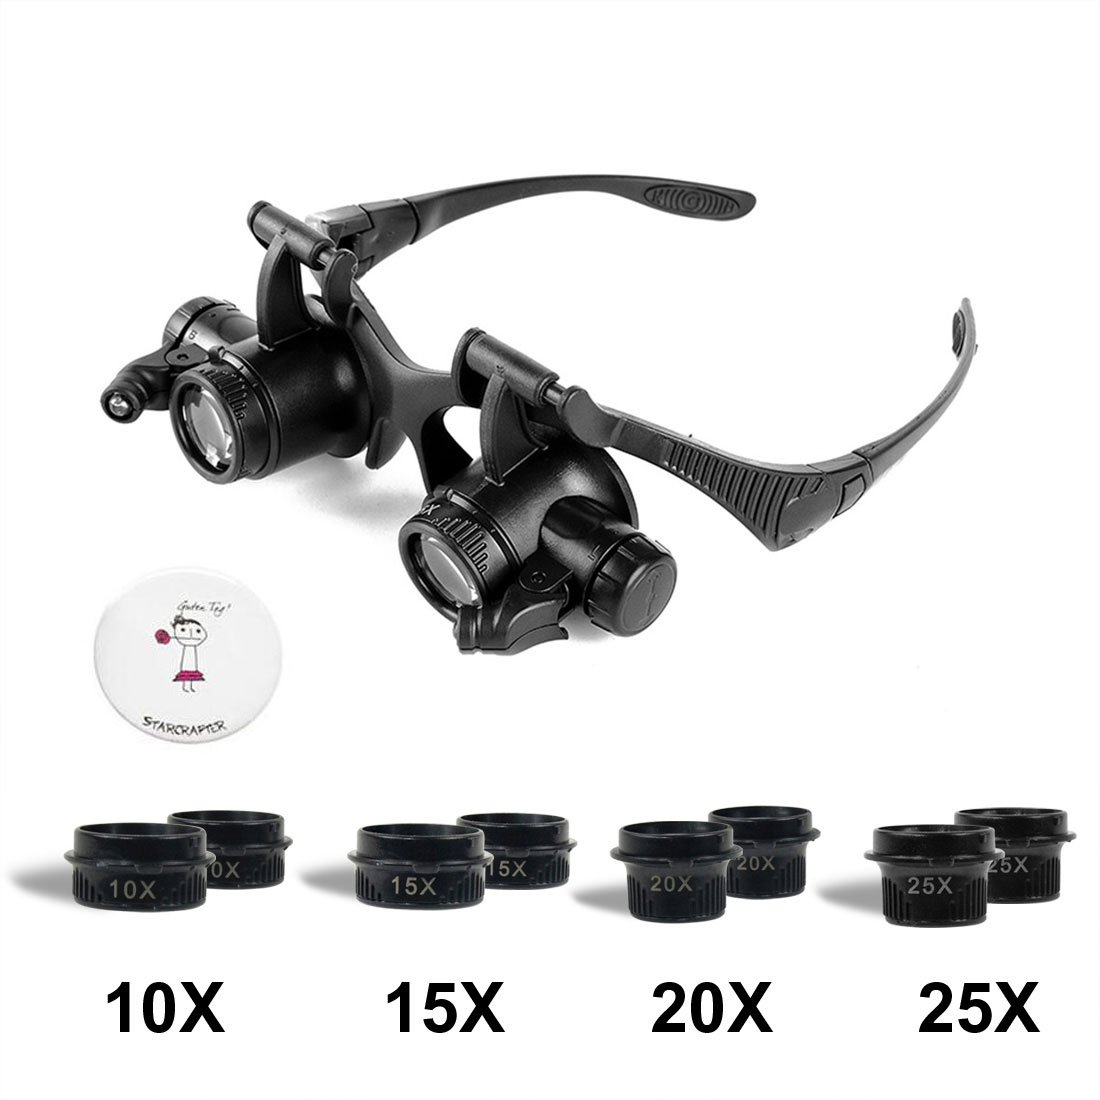 Starcrafter 10 x 15 x 20 x 25 x Gafas de ojo de lupa lupa LED de joyero  para reparación de relojes  Amazon.es  Electrónica ee69660b7f9a